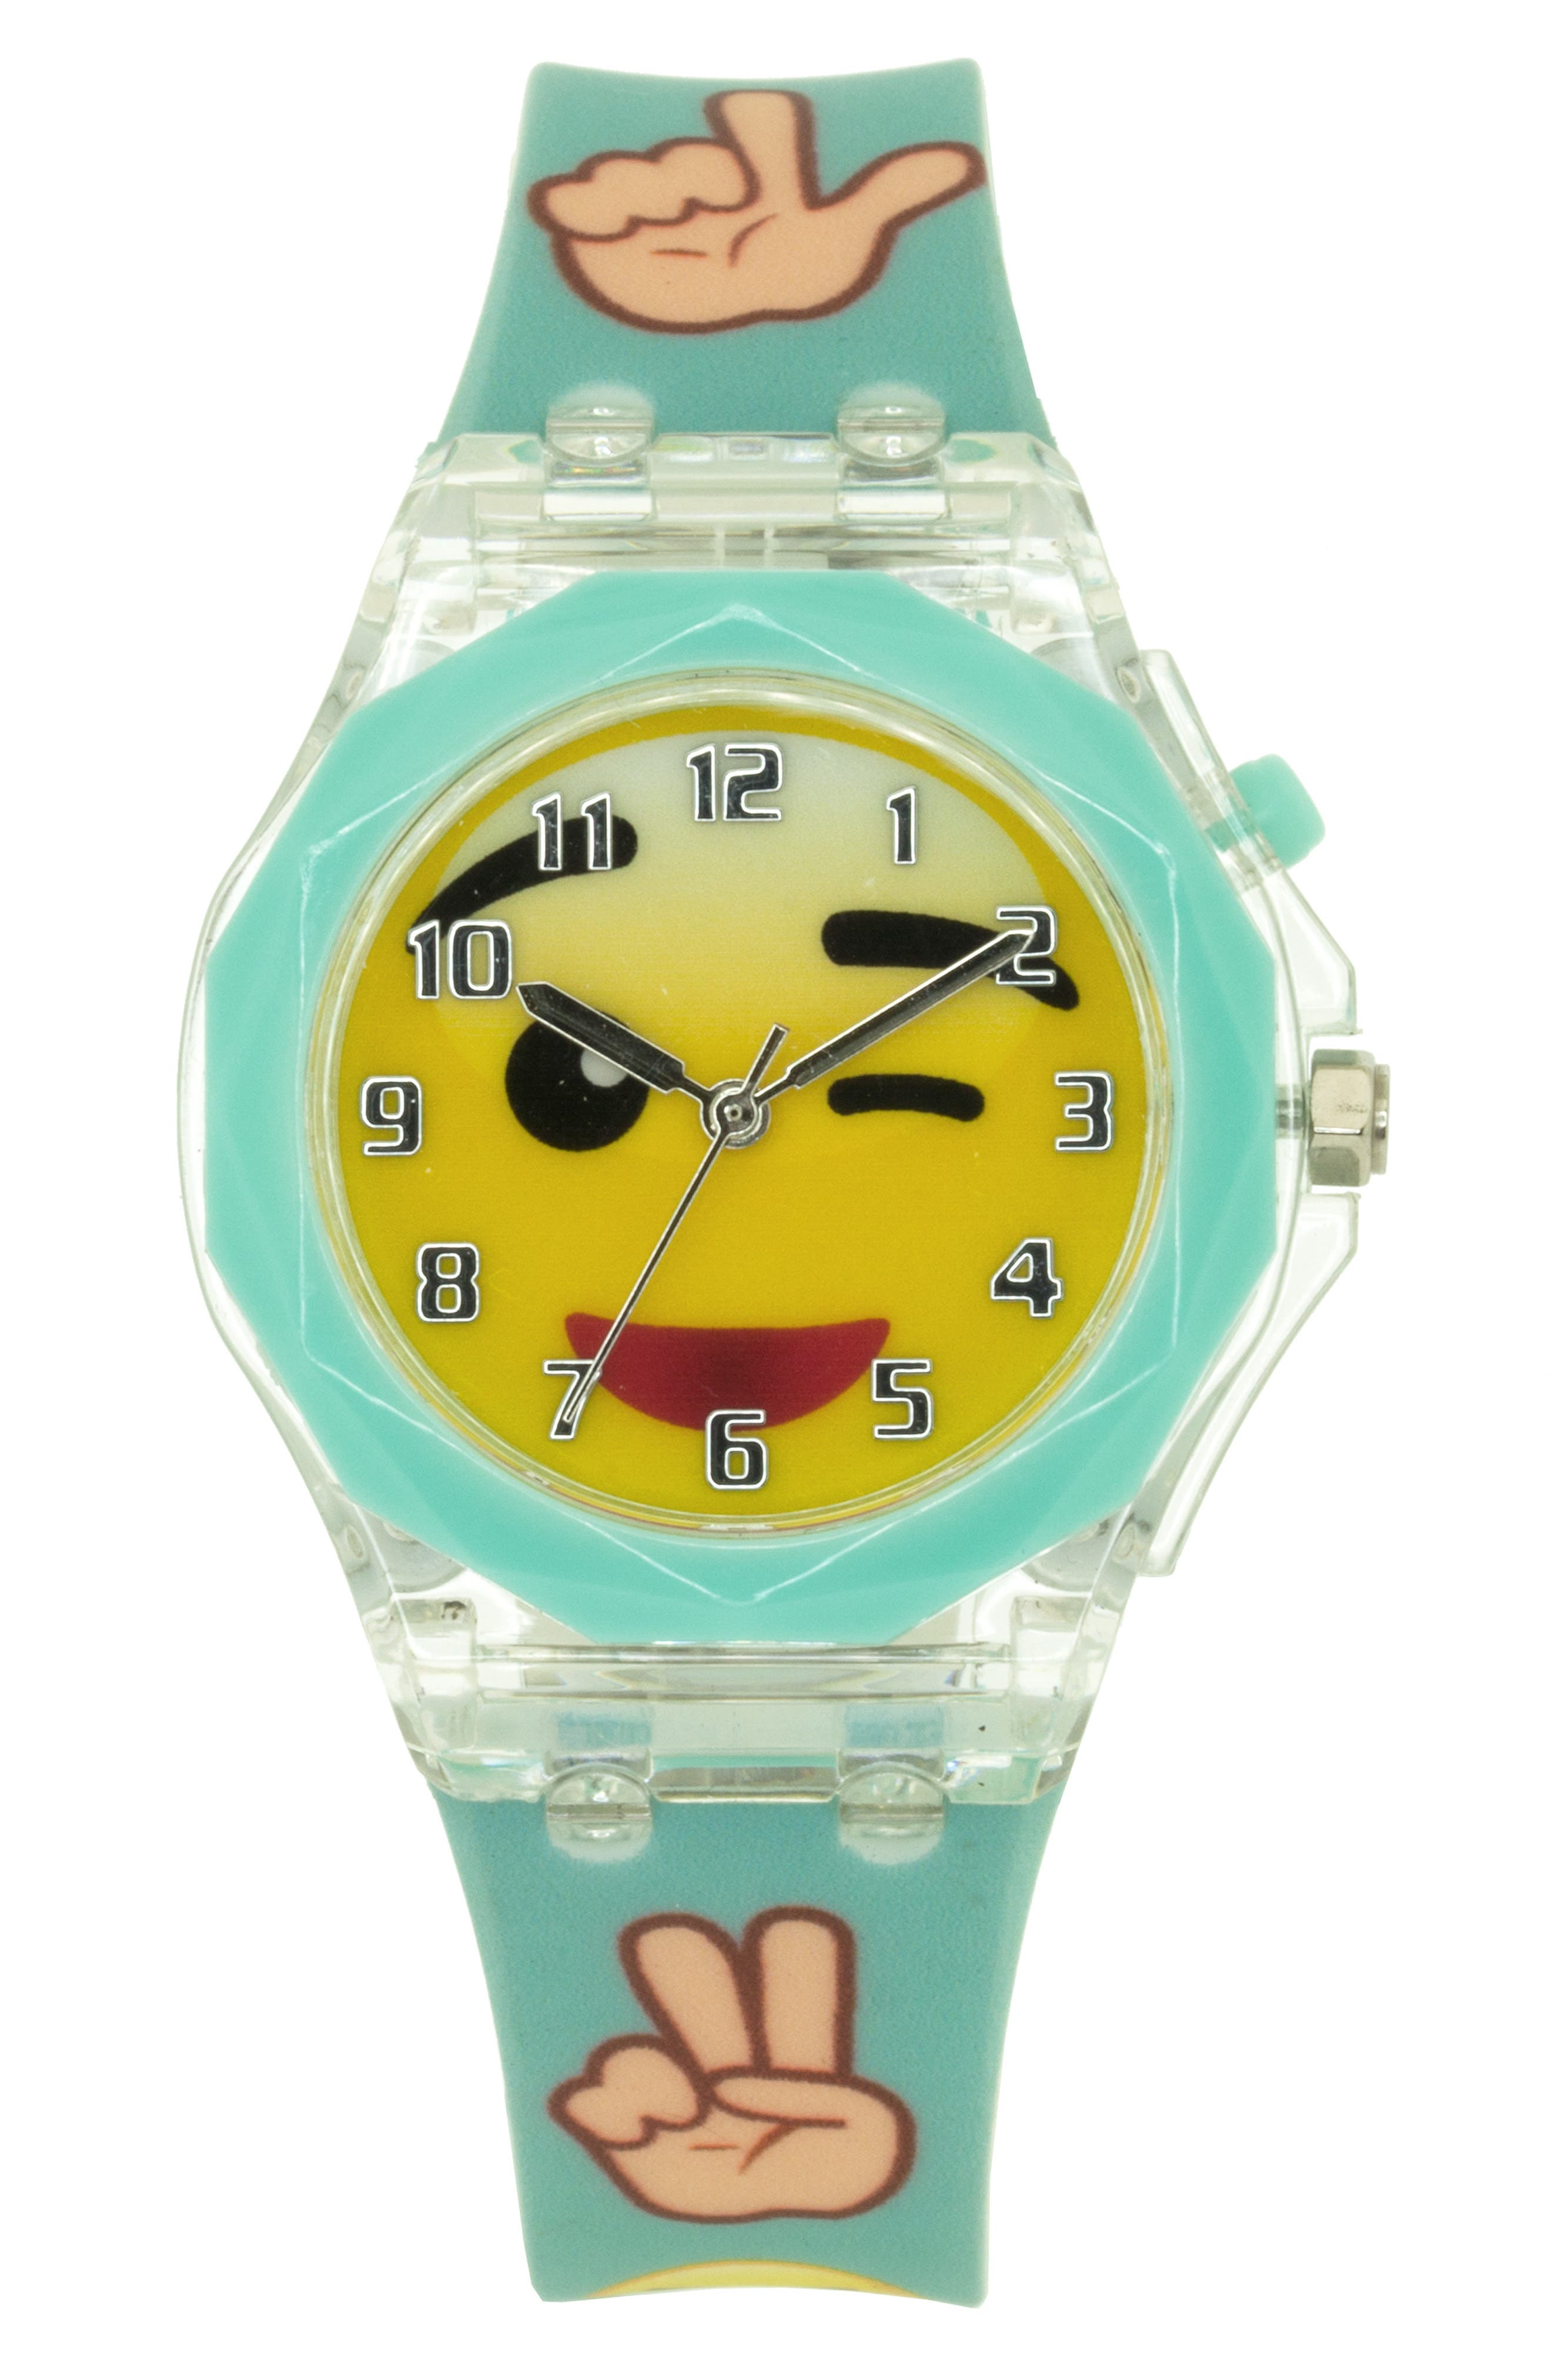 Flashing Winking Emoji Watch,                             Main thumbnail 1, color,                             300